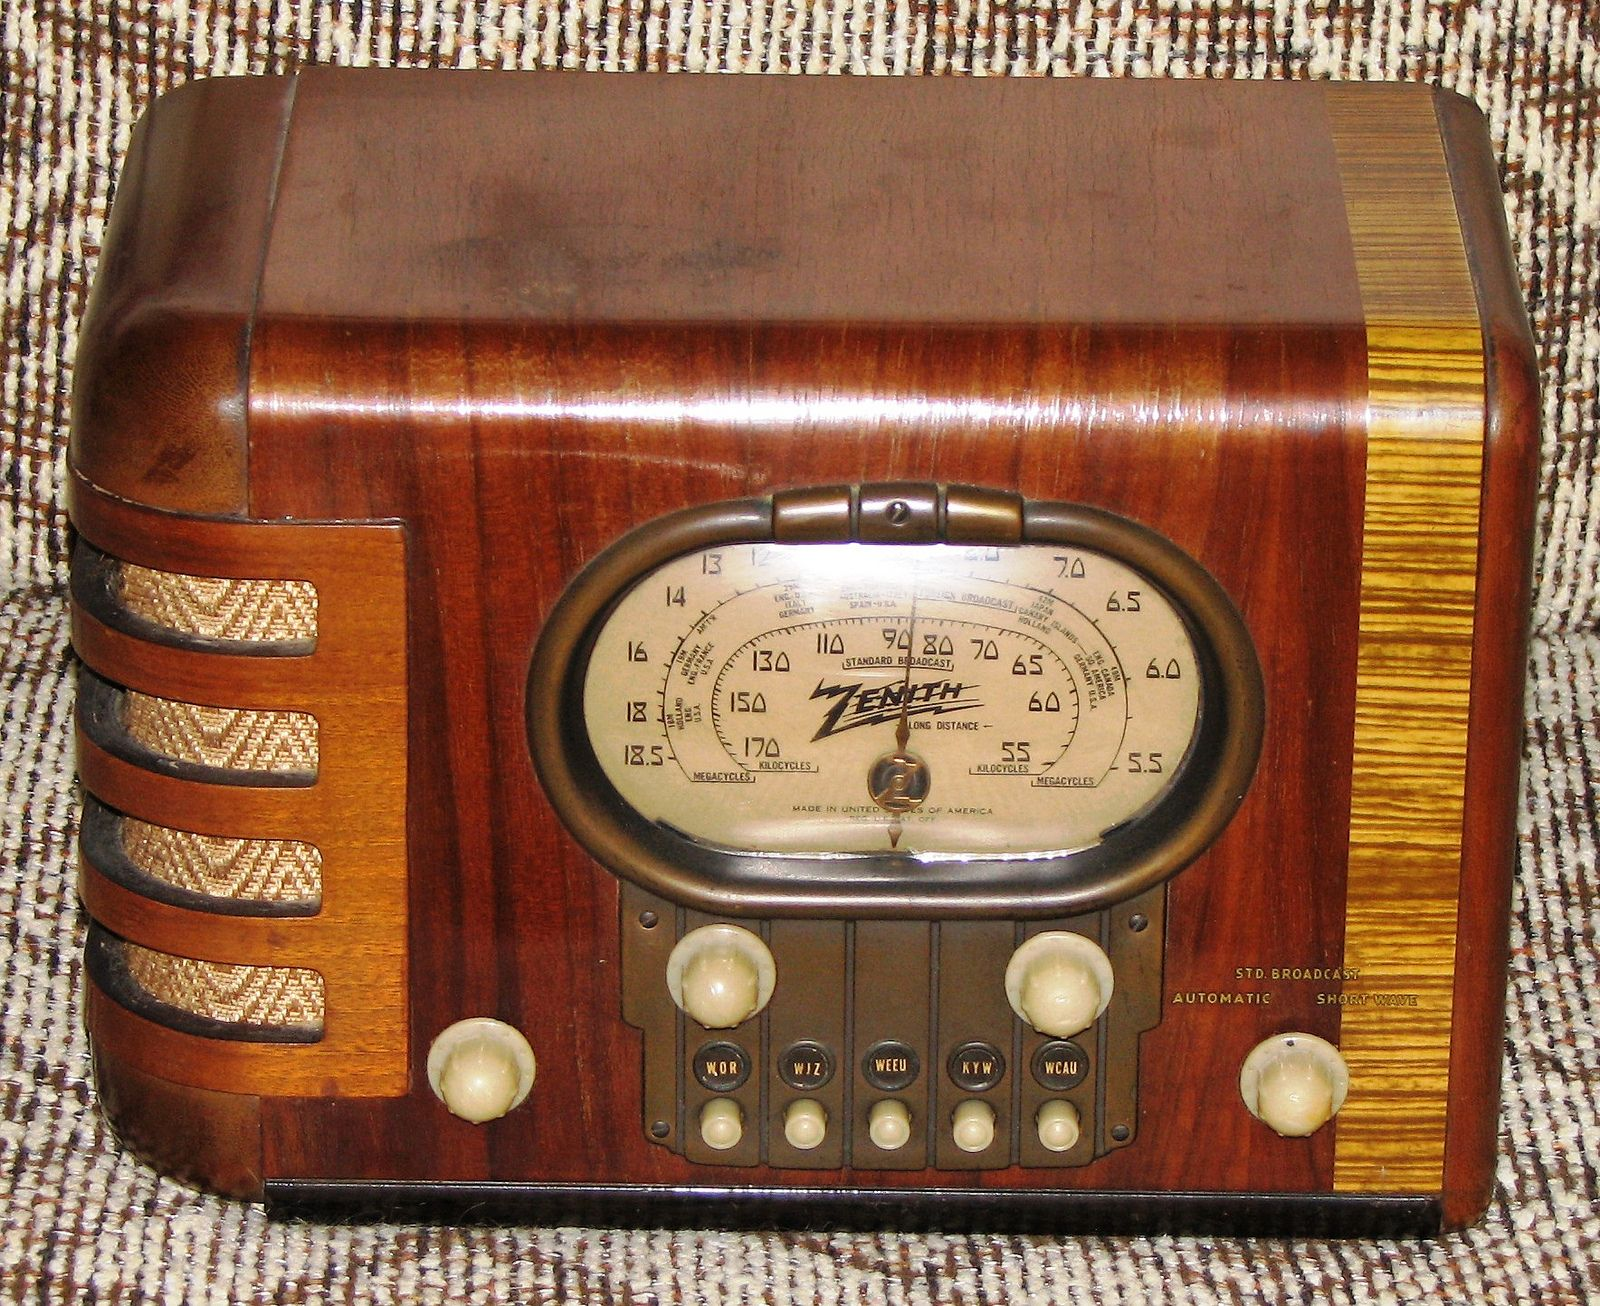 Vintage Zenith Art Deco Table Radio Vintage Radio Retro Radios Antique Radio